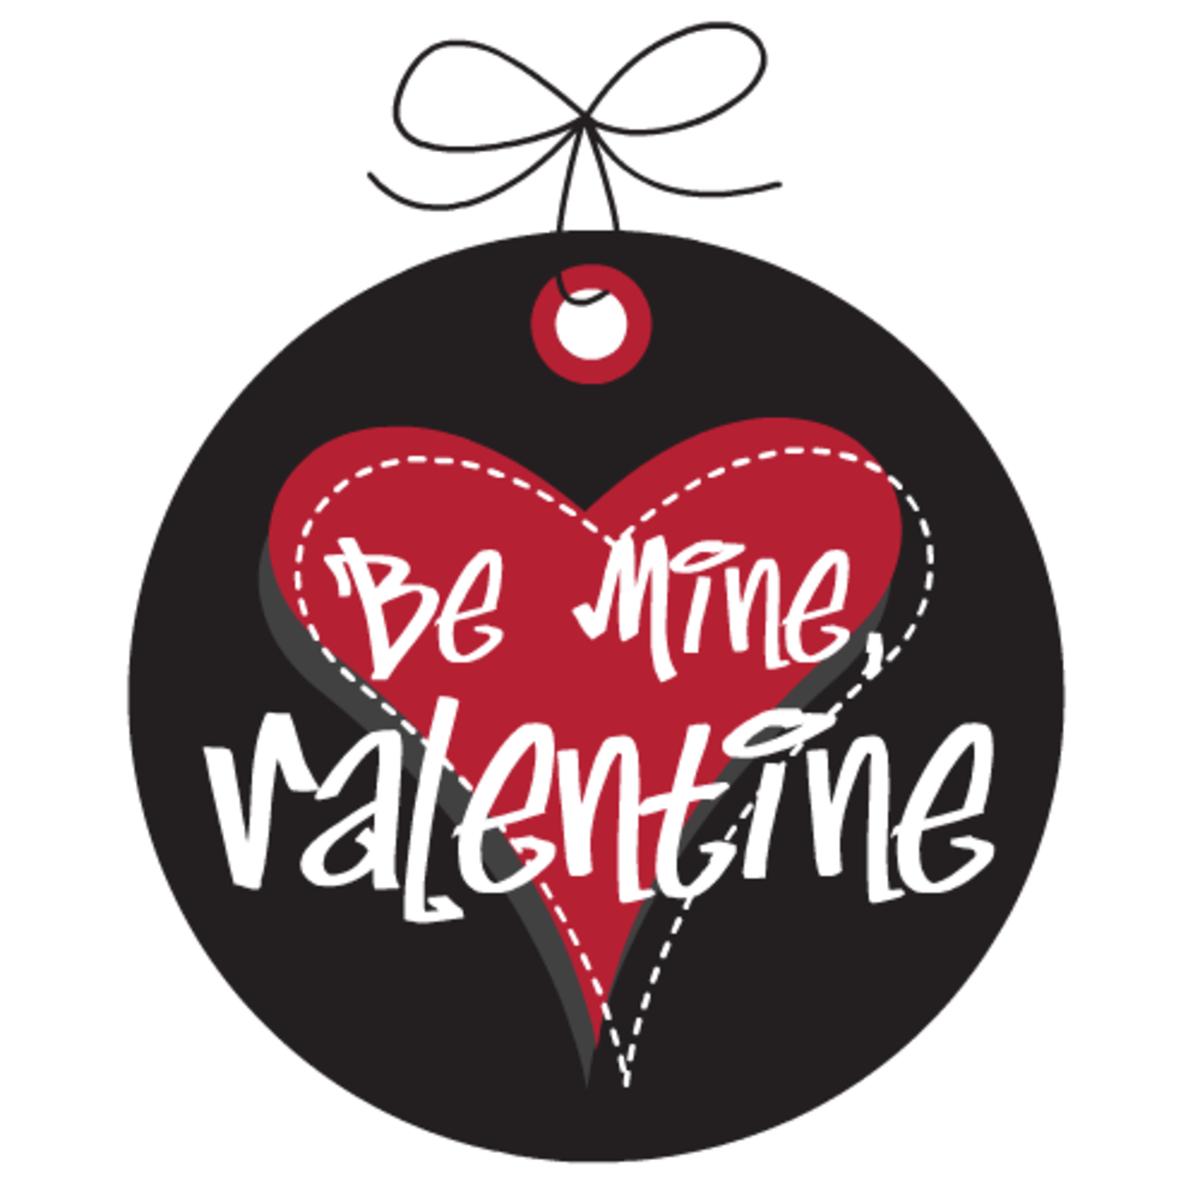 Valentine's Day tags: Be Mine, Valentine